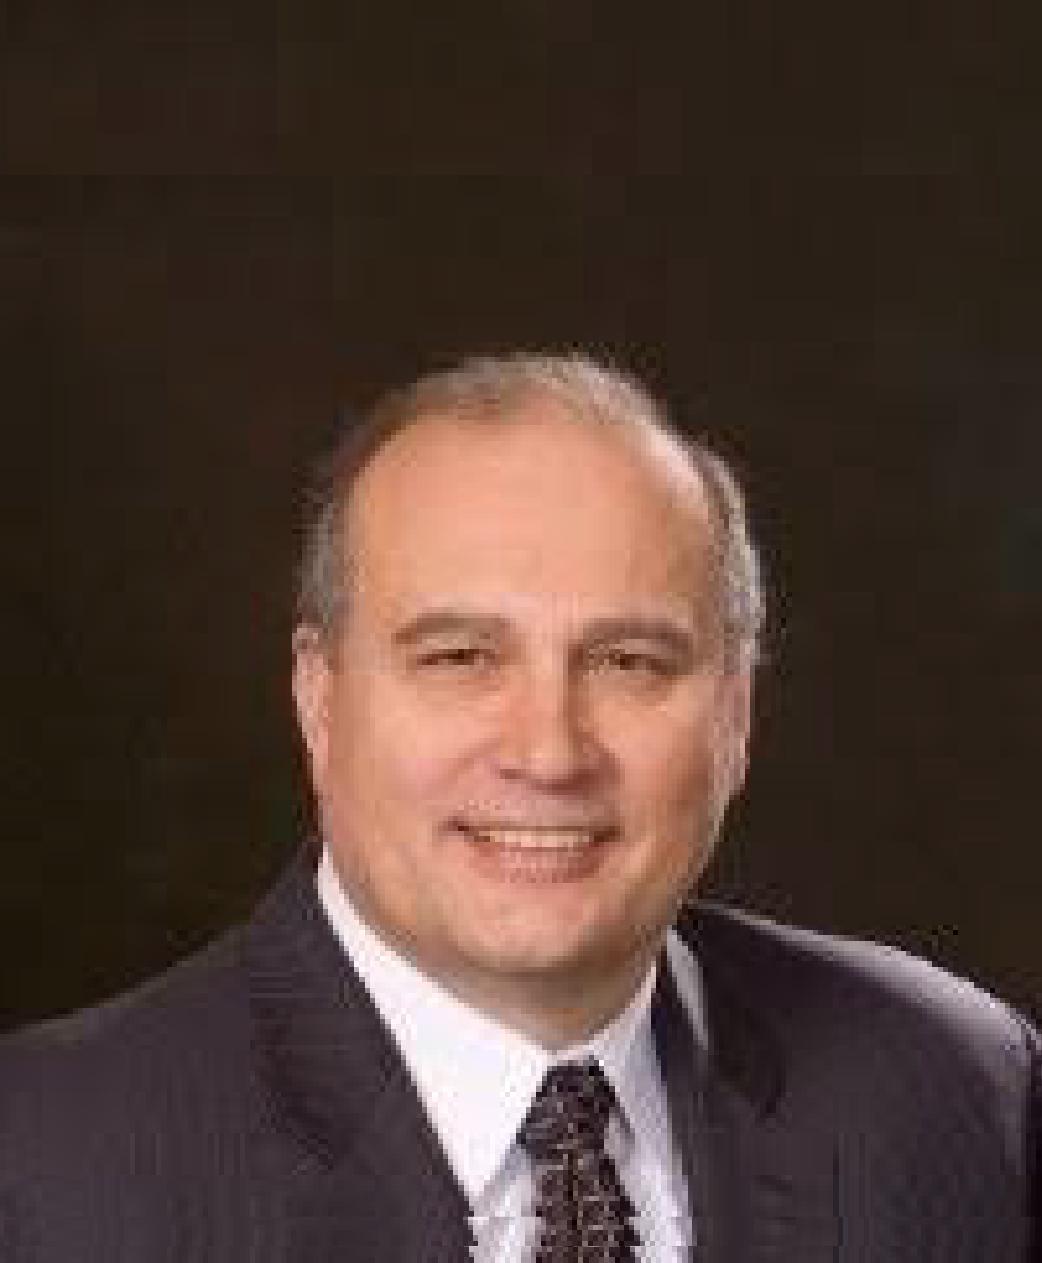 Michael Daigle